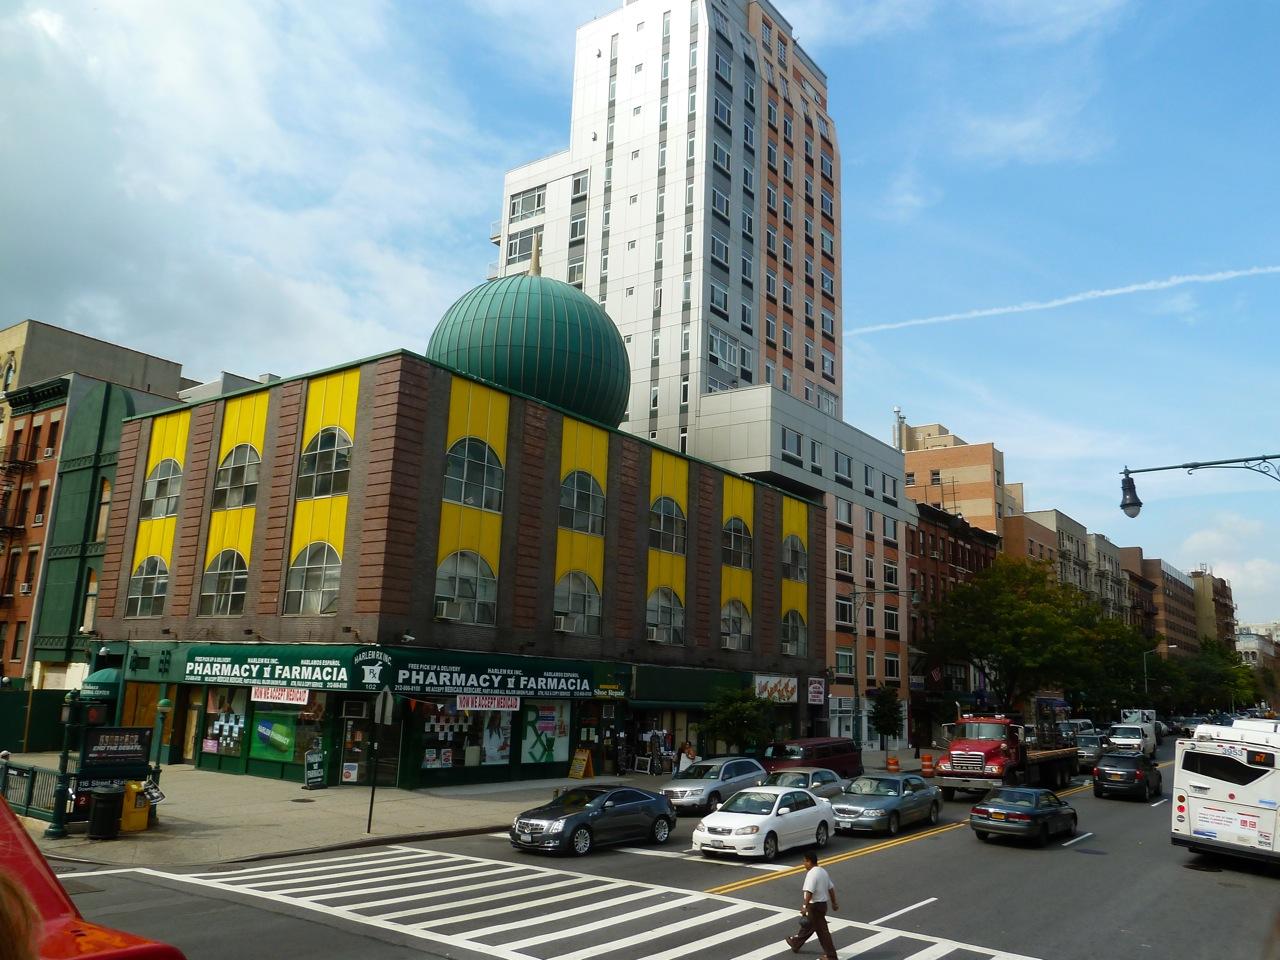 http://4.bp.blogspot.com/-ShKa4z09v7E/ToEPdzMiEVI/AAAAAAAAAwY/tRKTEpXLMWc/s1600/NYC18.jpg